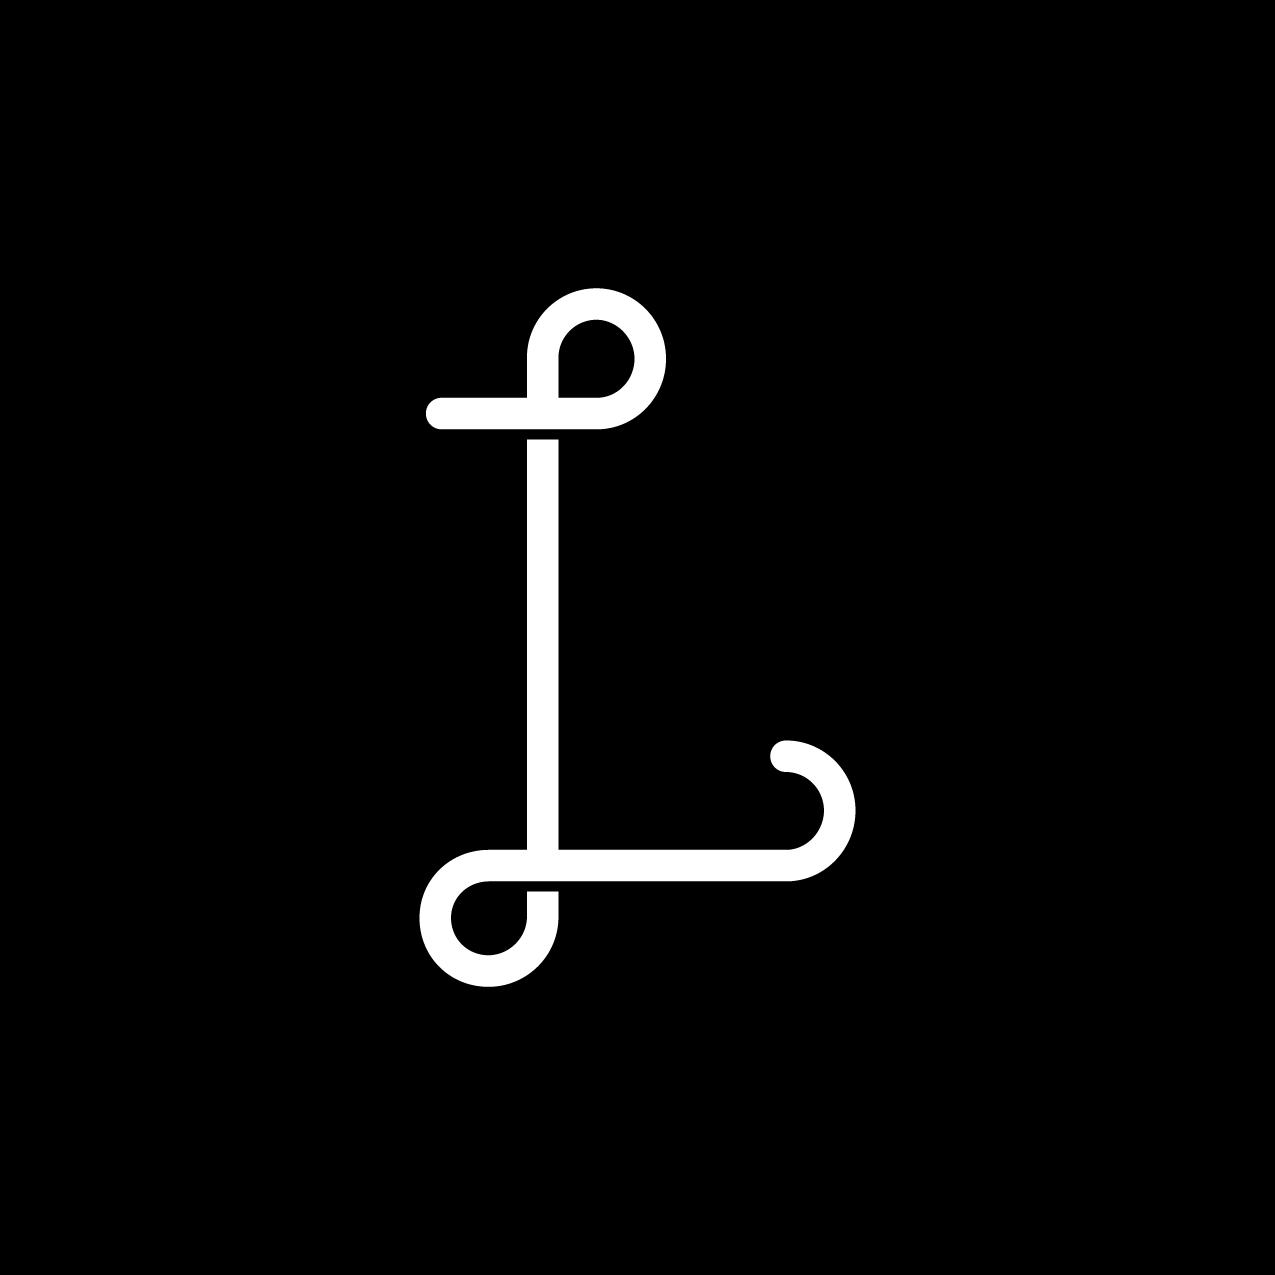 Letter L14 Design by Furia